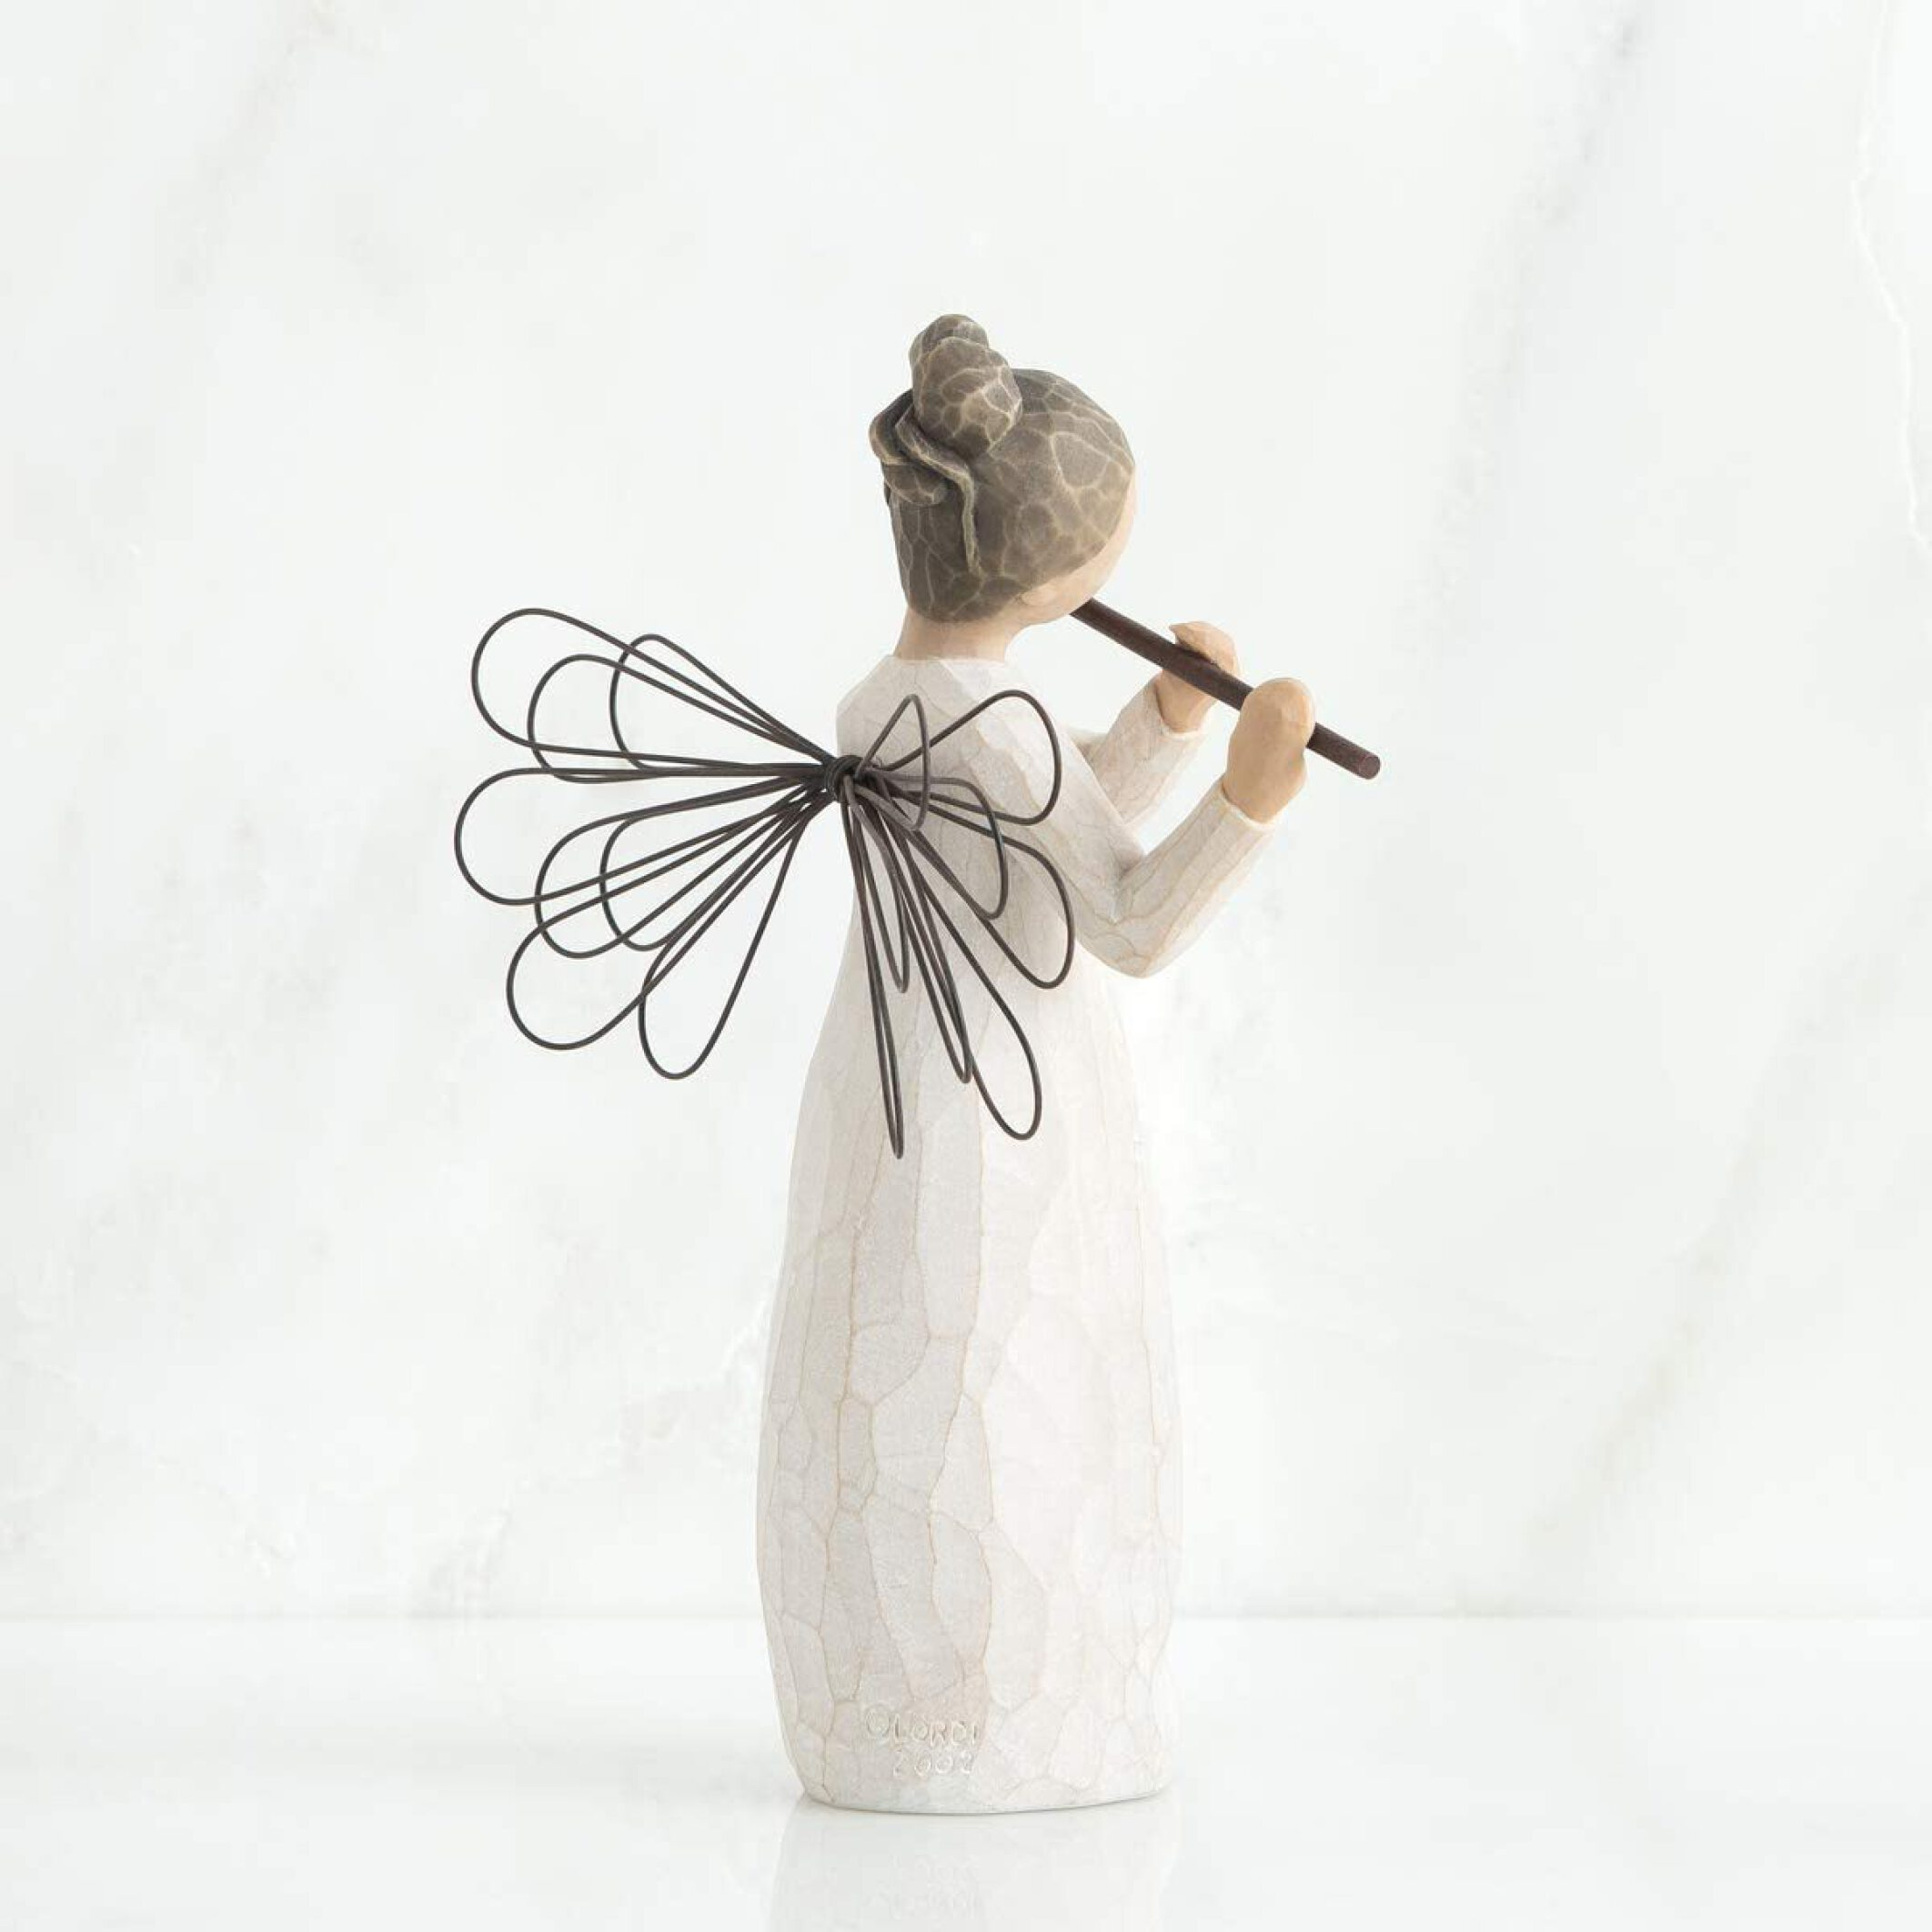 فیگور ویلوتری angel of harmony